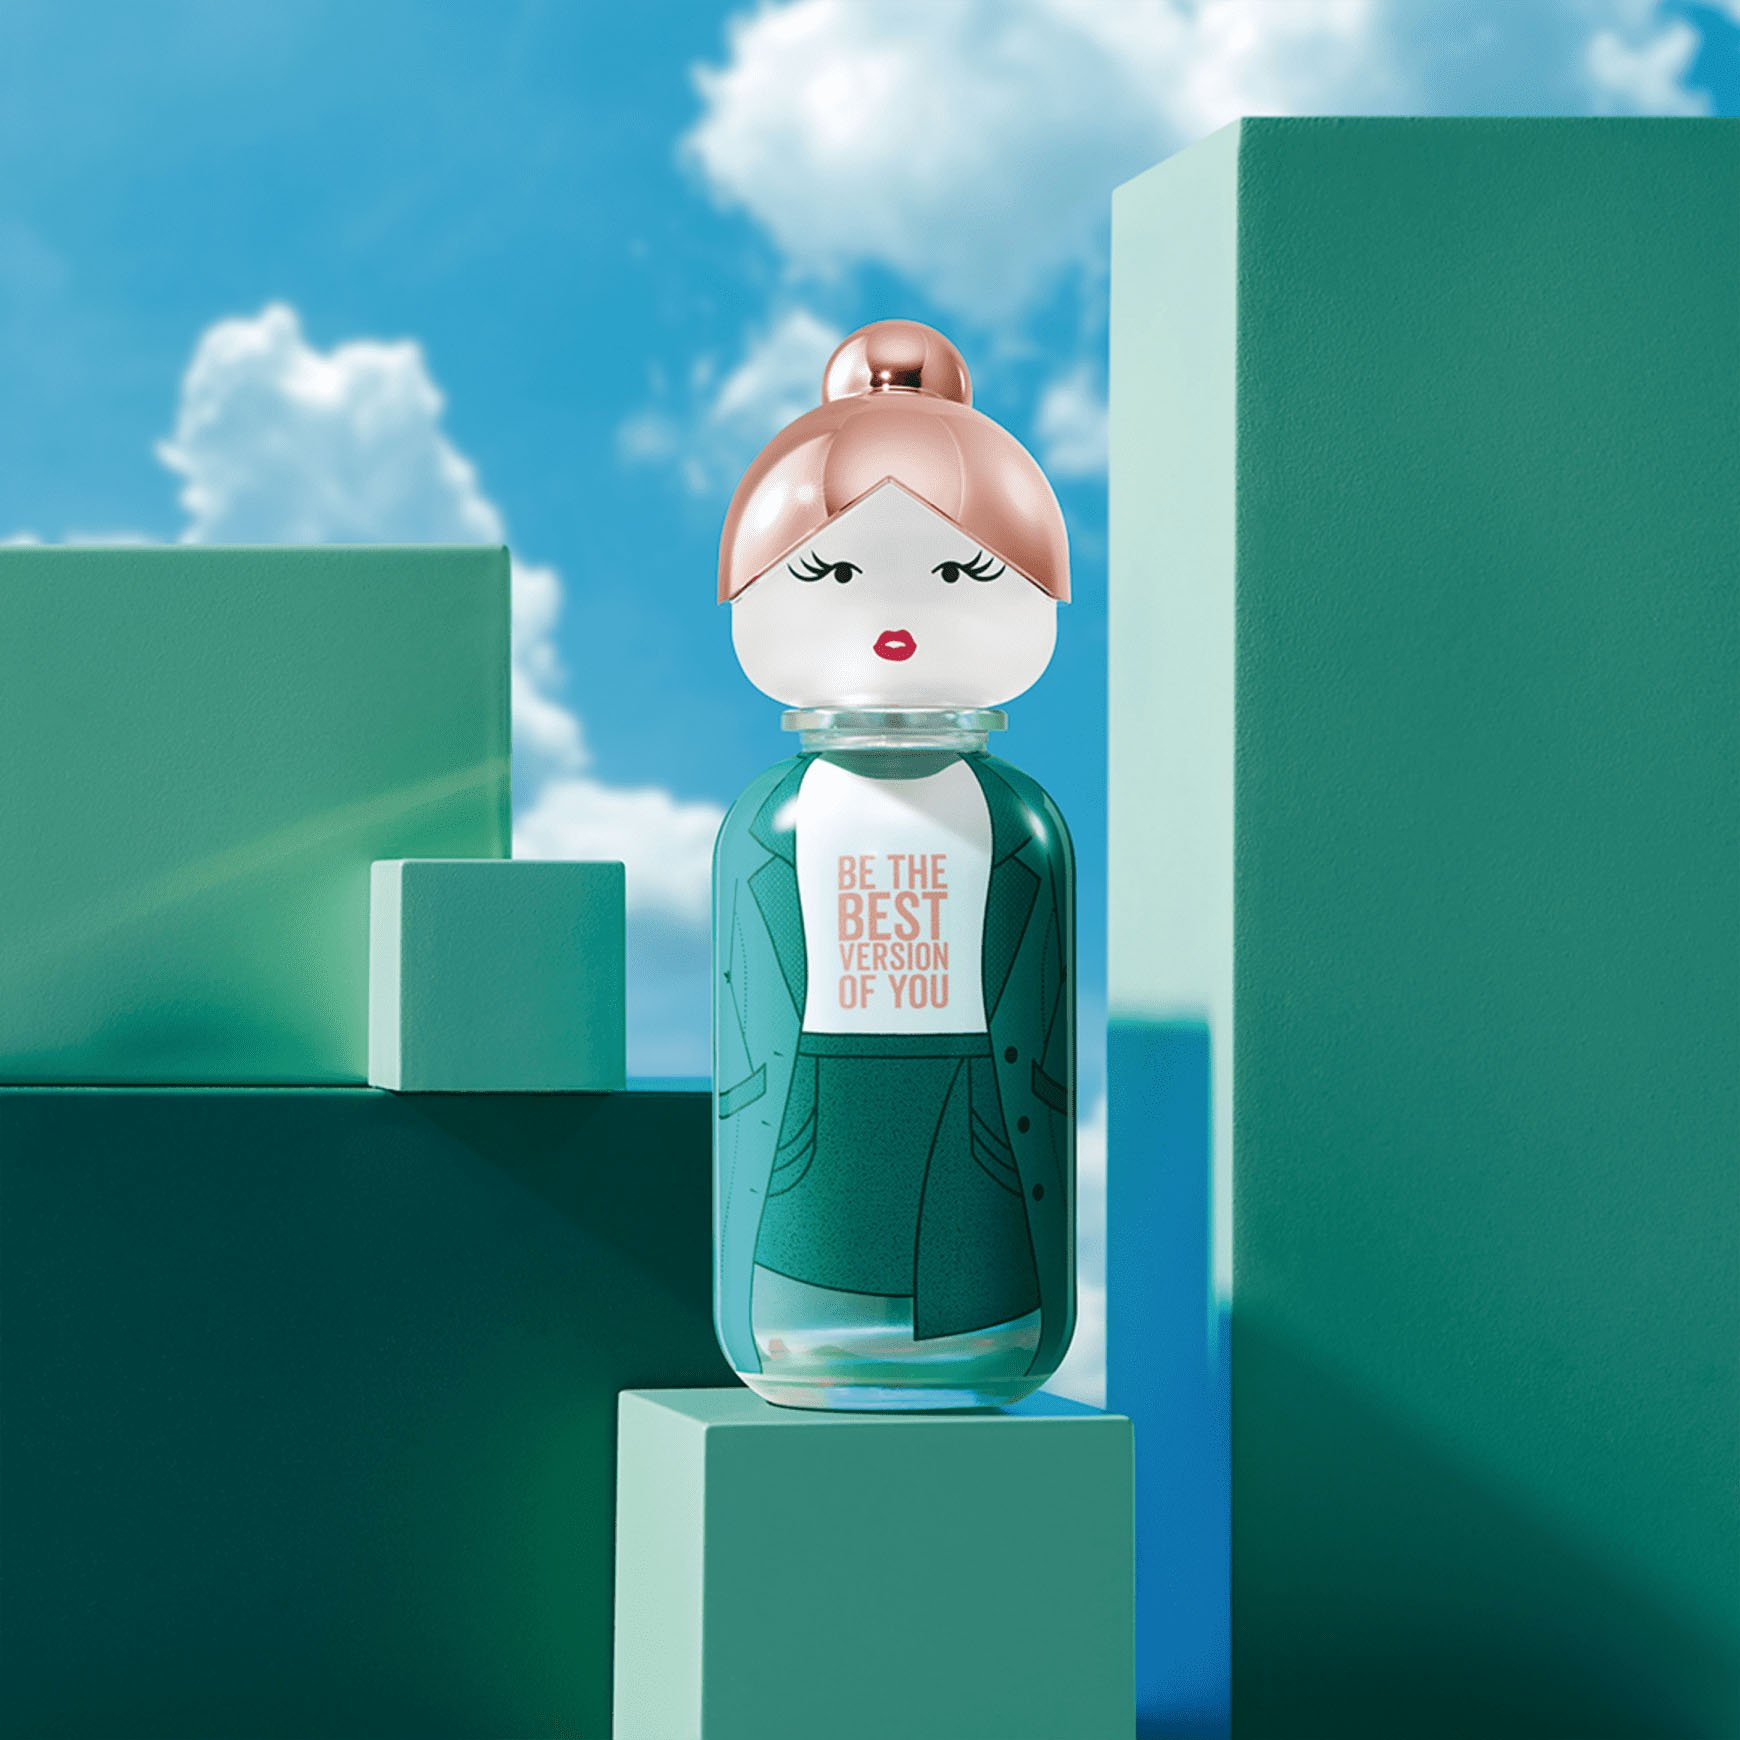 perfume benetton sisterland green jasmine feminino 80 ml 51066 2000 203193 3